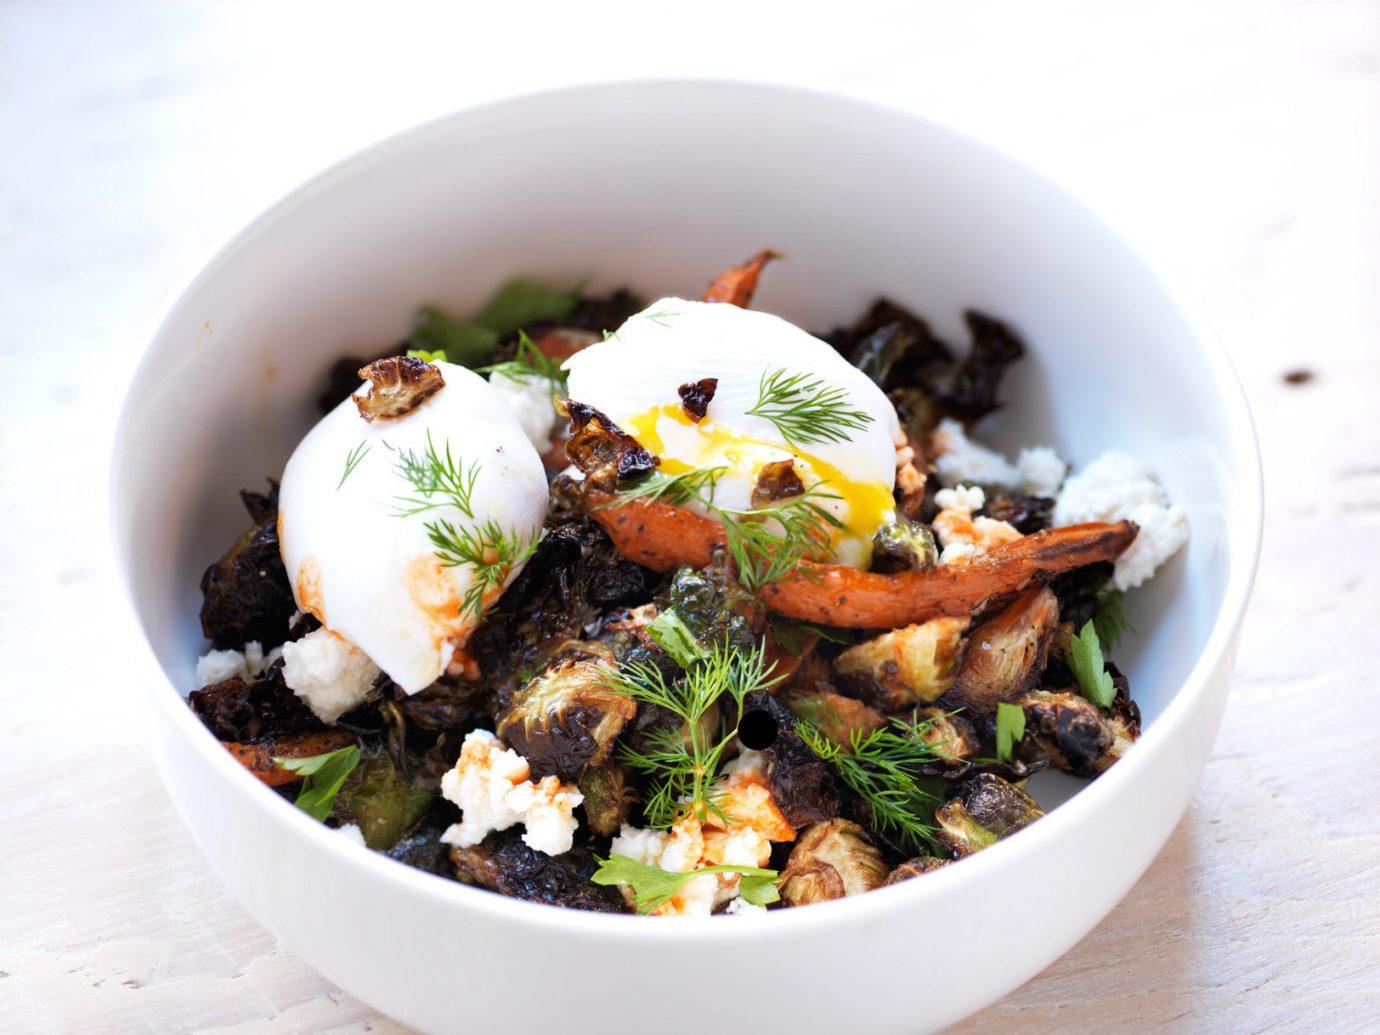 Food + Drink food plate dish bowl vegetable produce salad meal cuisine leaf vegetable coconut vegetarian food breakfast different containing